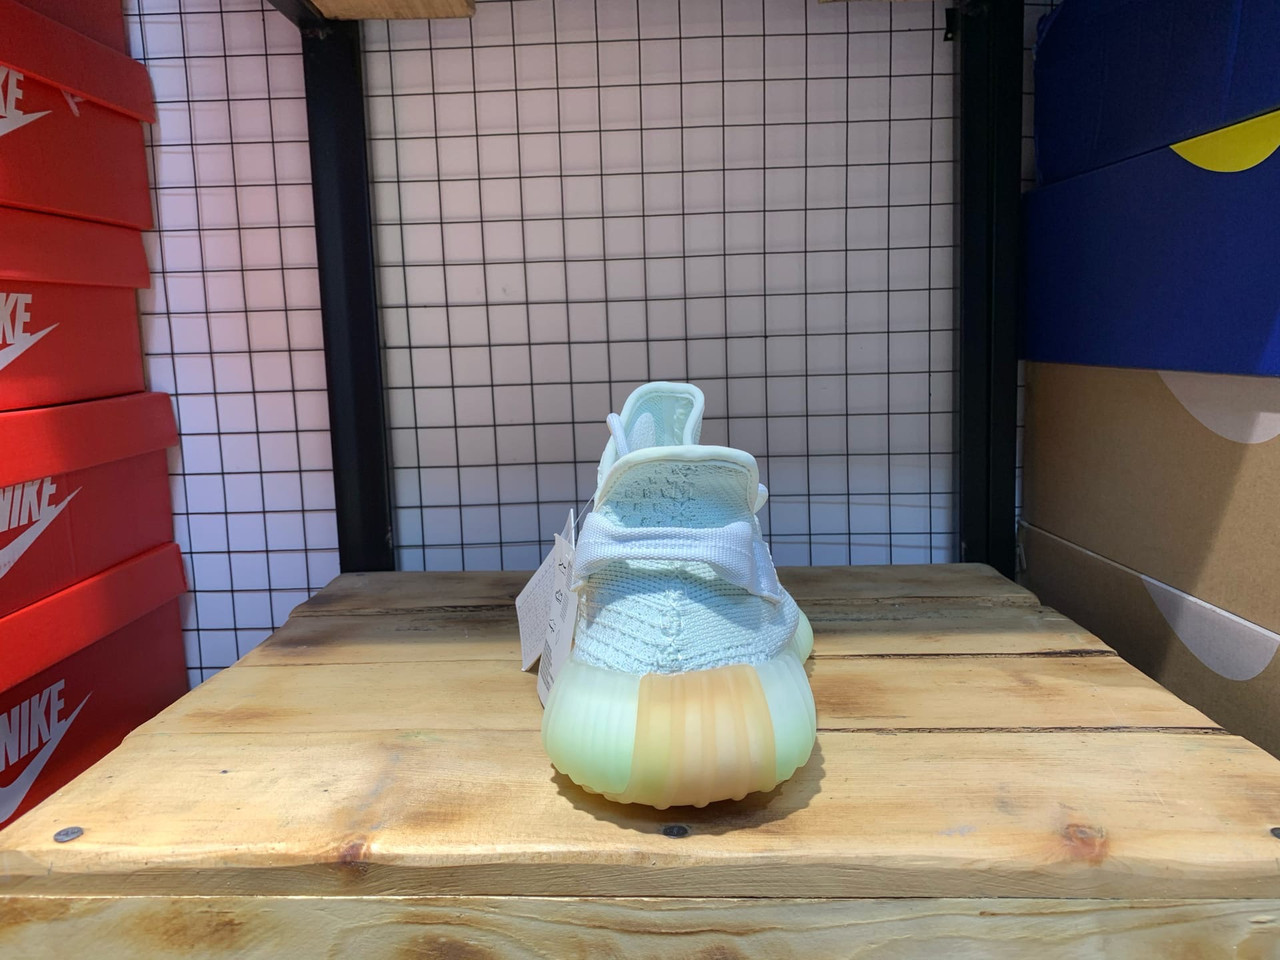 Кроссовки Adidas Yeezy Boost 350 V2 Hypers - фото 4